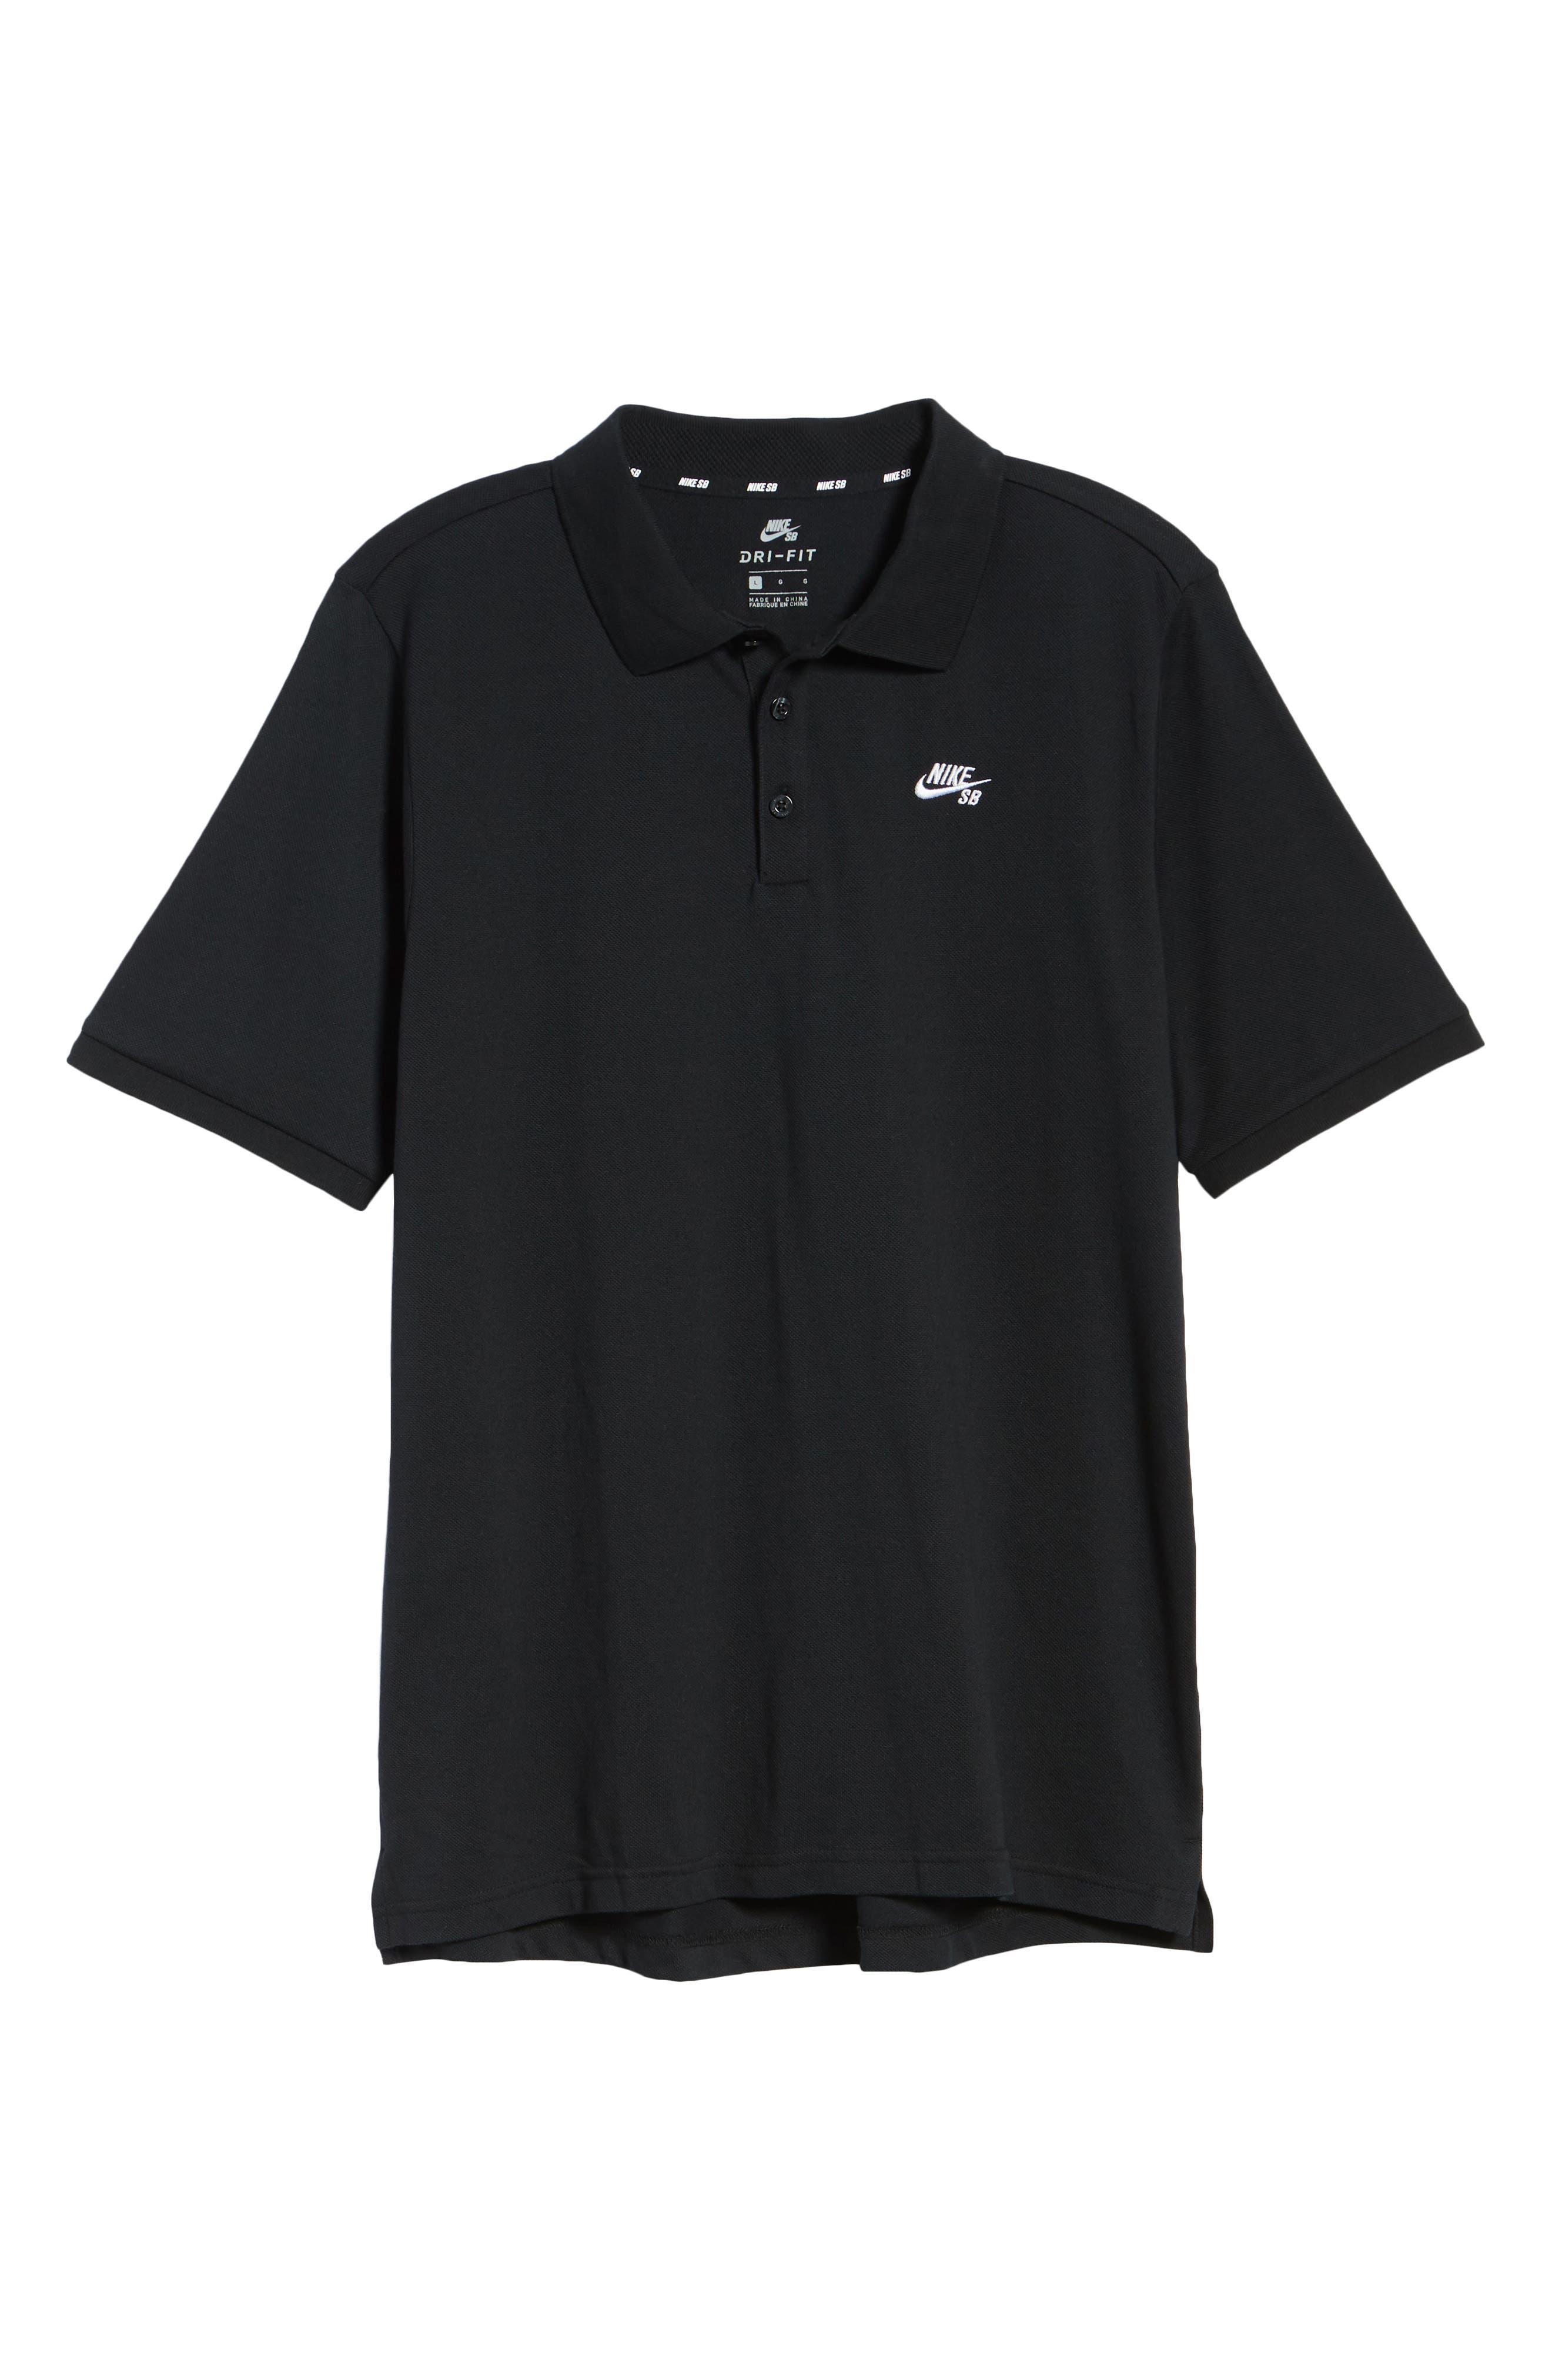 Dri-FIT Piqué Polo,                             Main thumbnail 1, color,                             BLACK/ WHITE